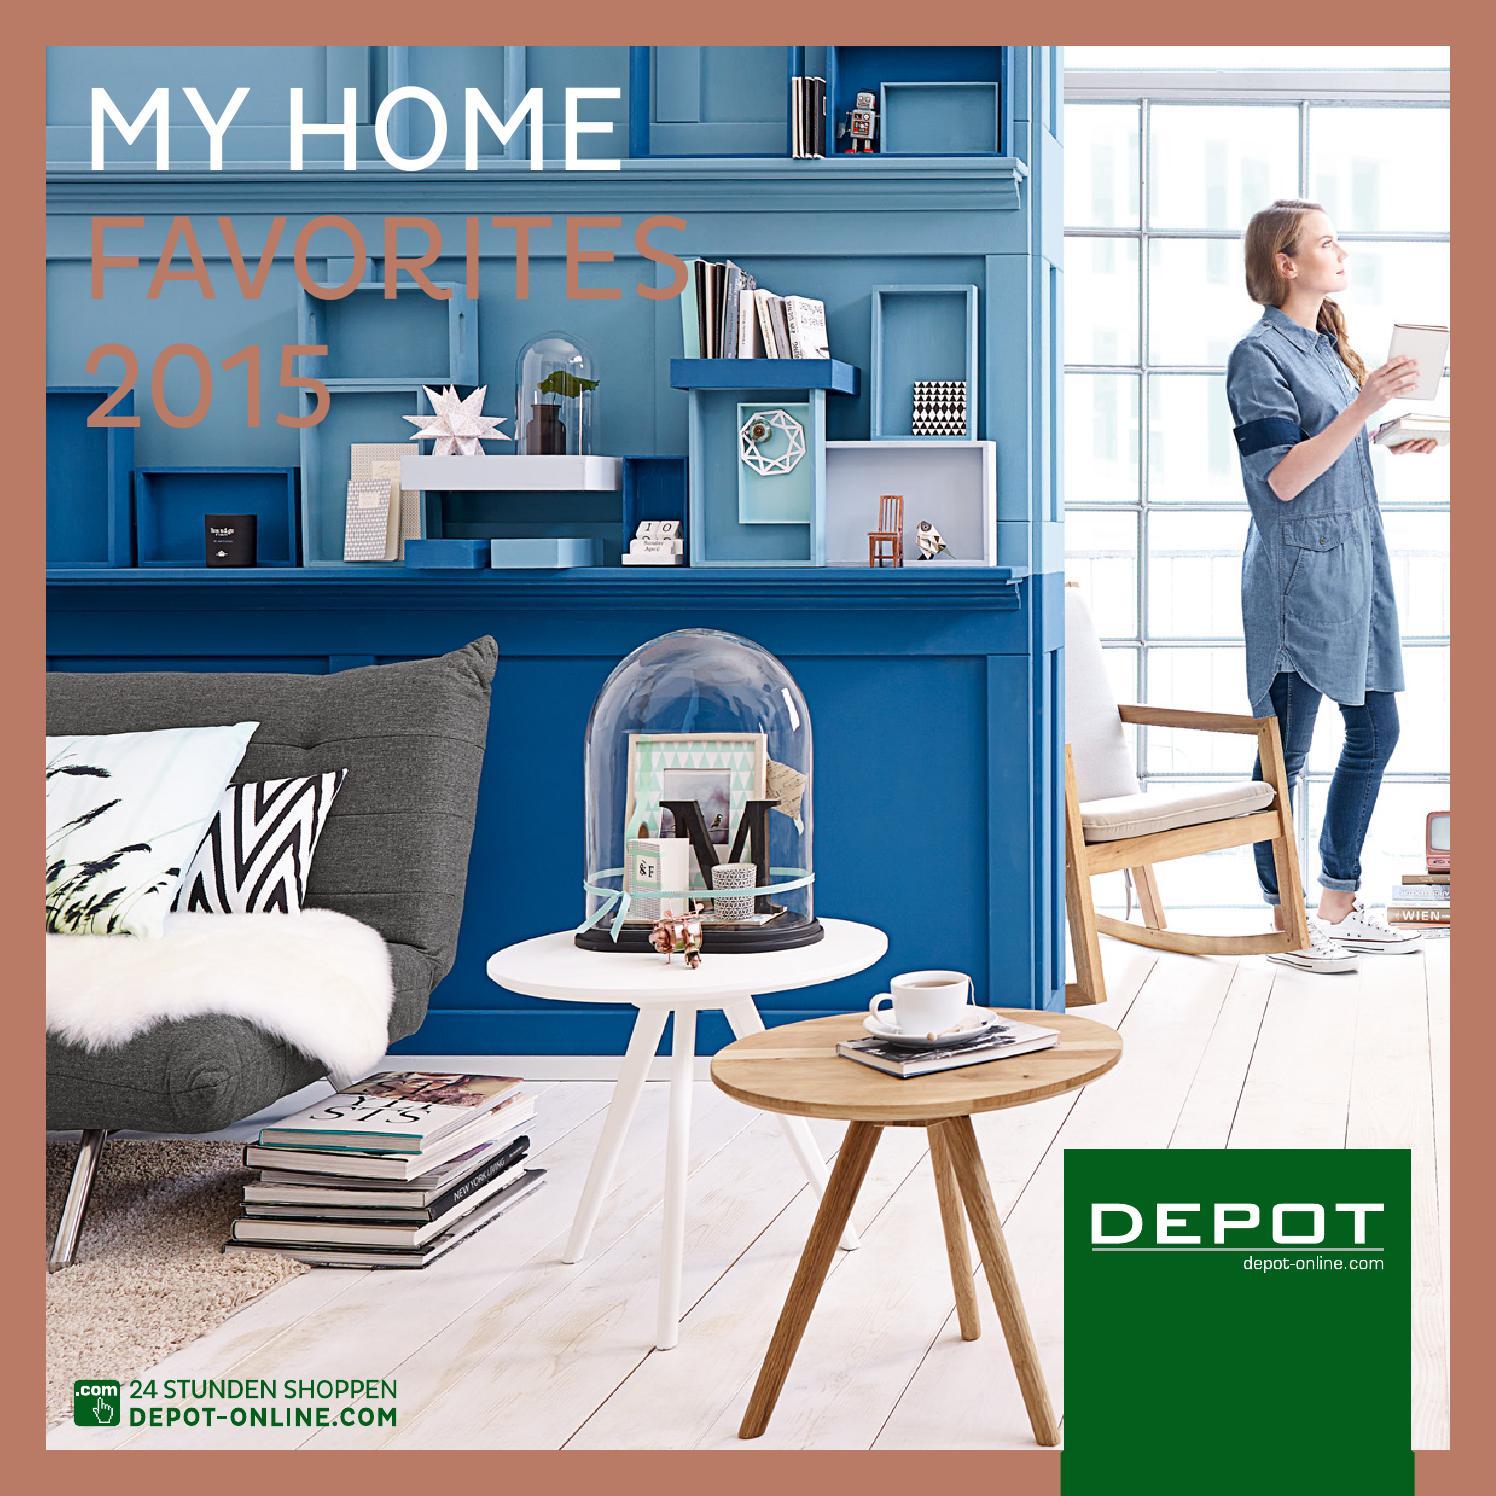 Depot Angebote My Home Favorites 2015 By Promoprospekte De Issuu